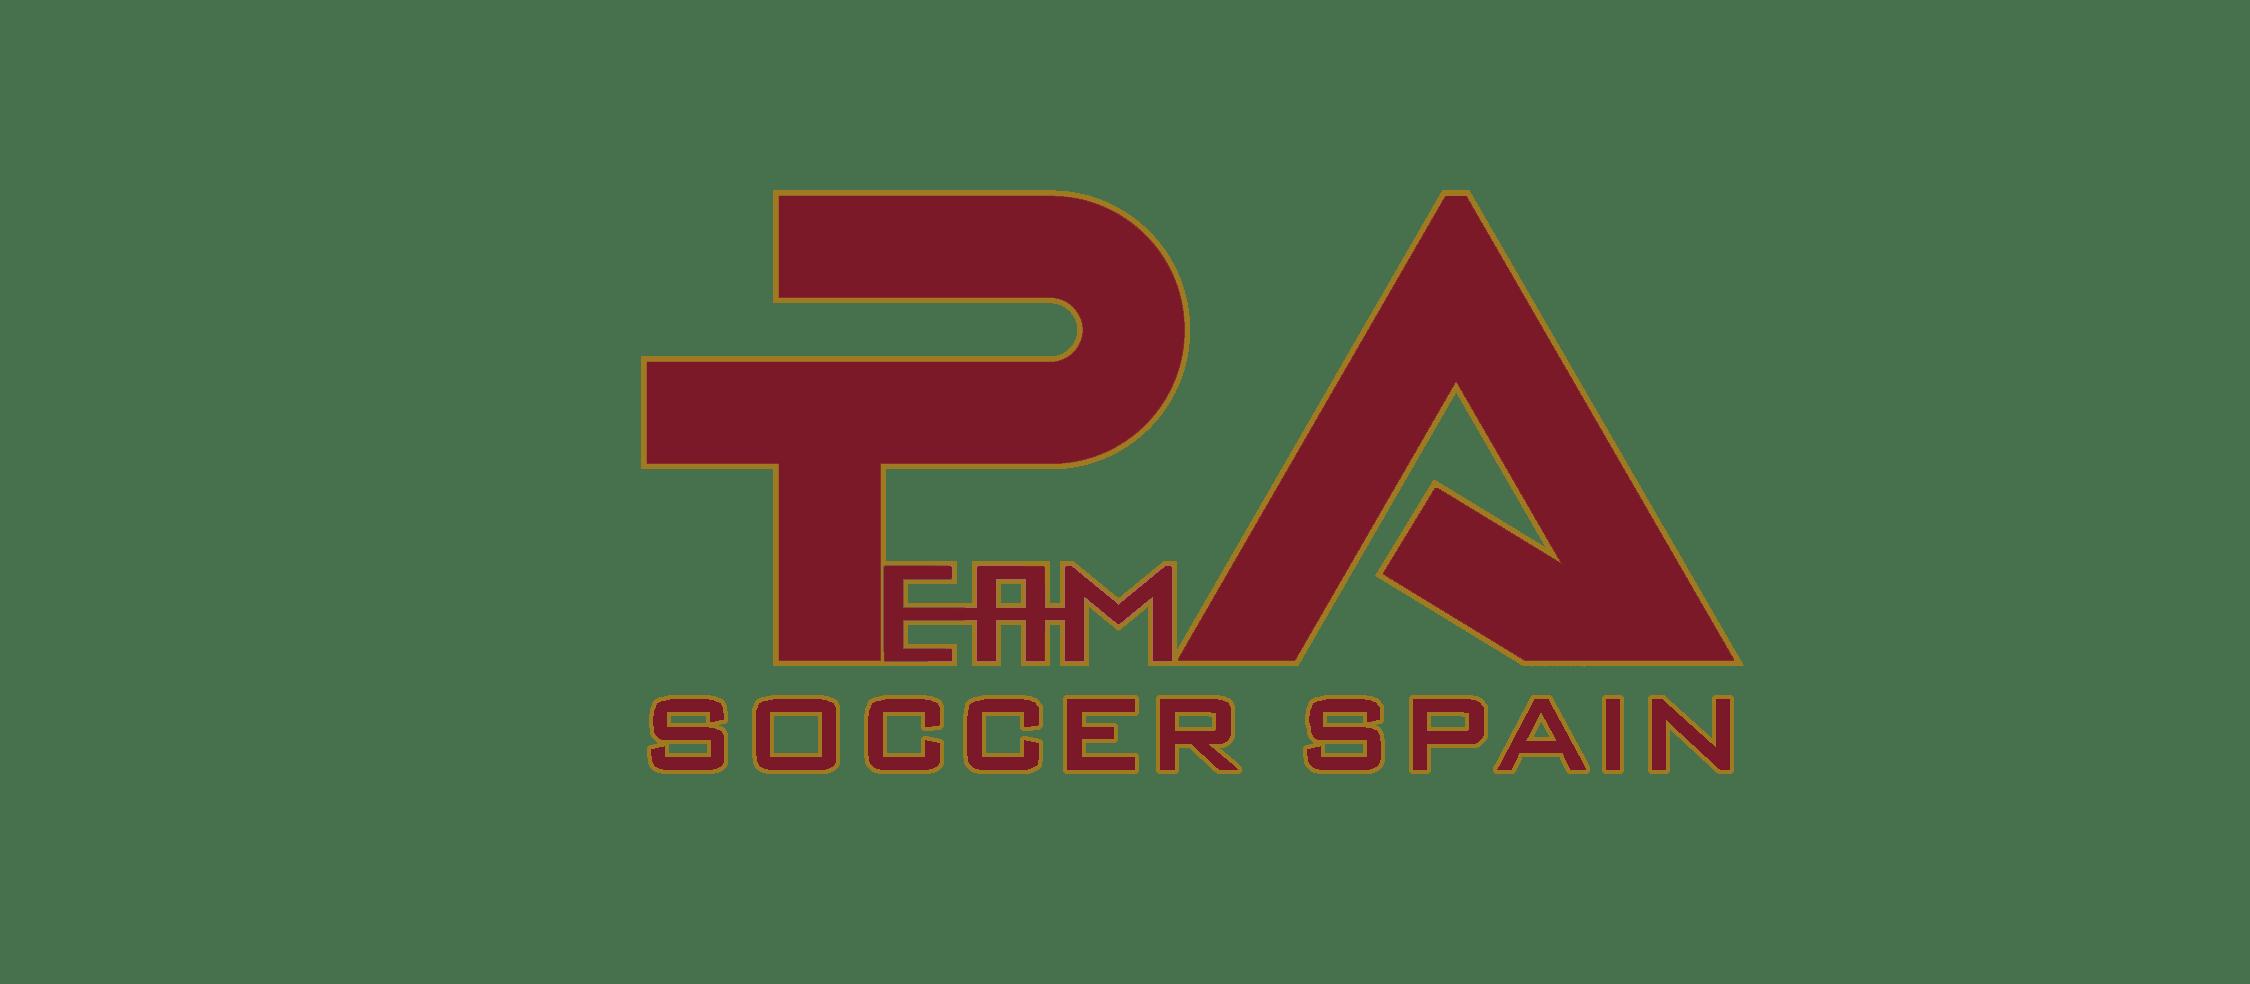 PA Team Soccer Spain